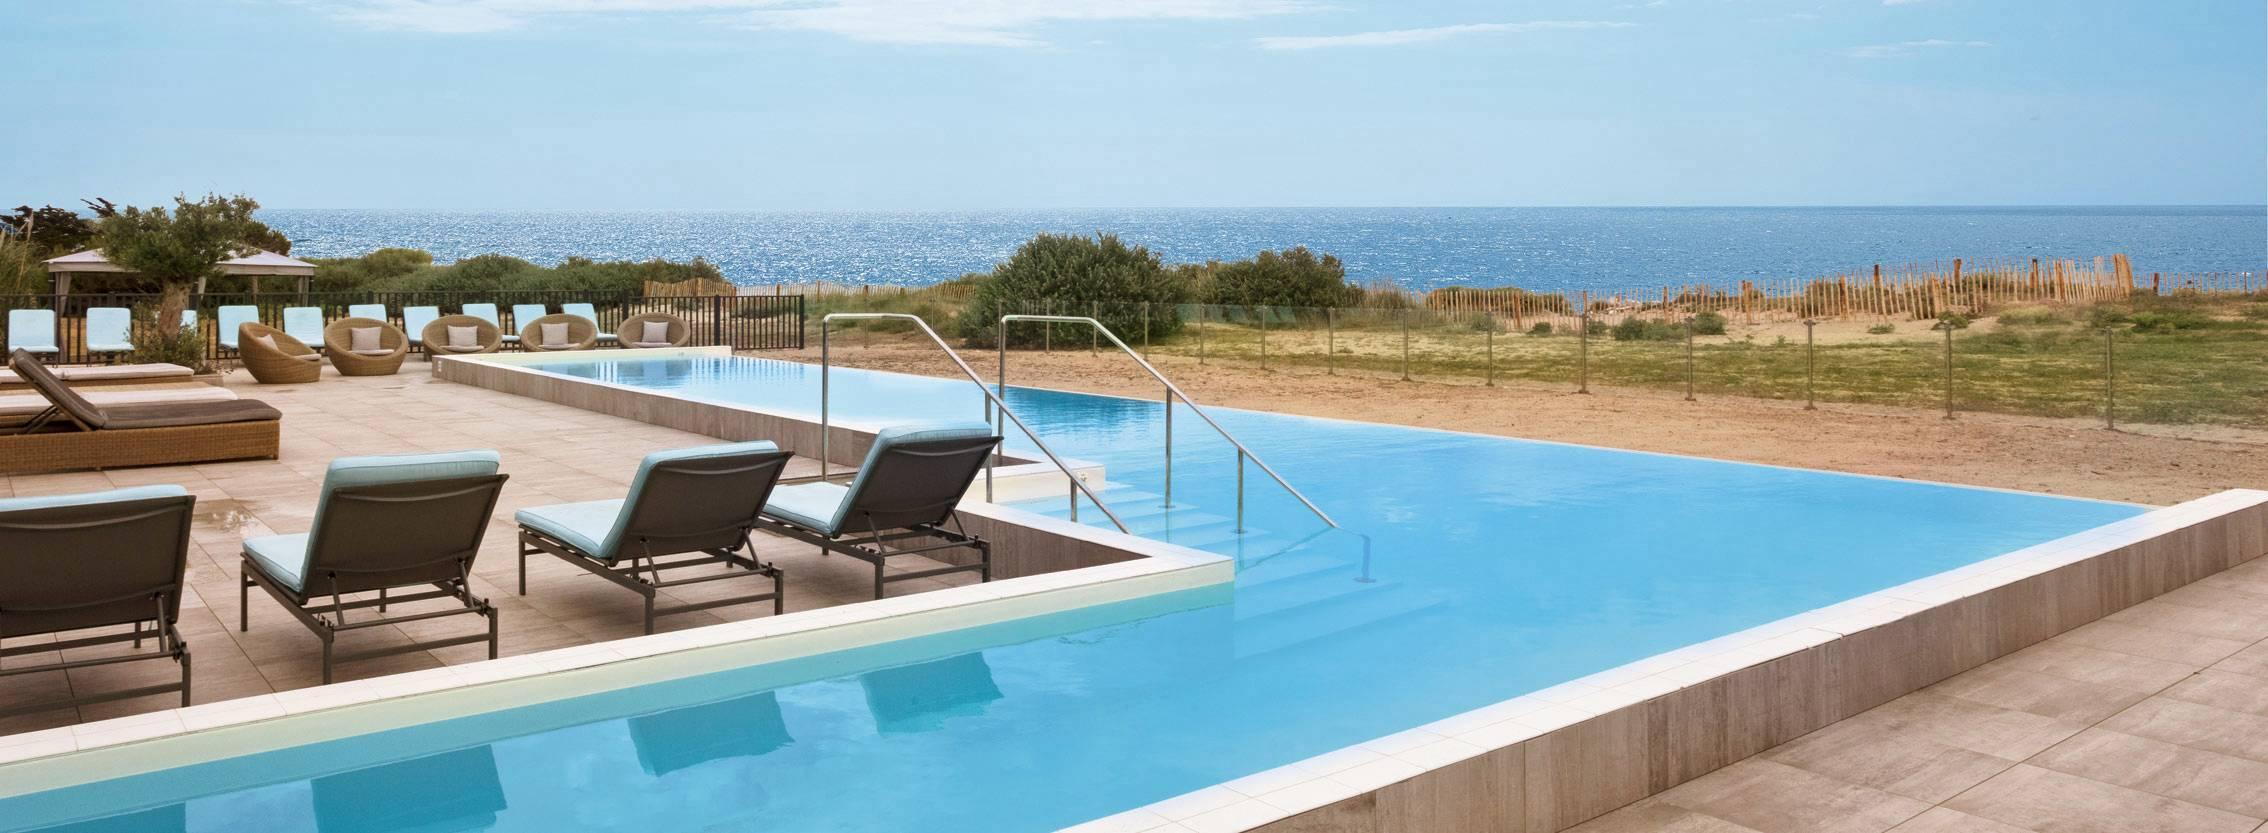 Relais Thalasso Atalante & Spa – Wellness Hôtel Thalasso & Spa